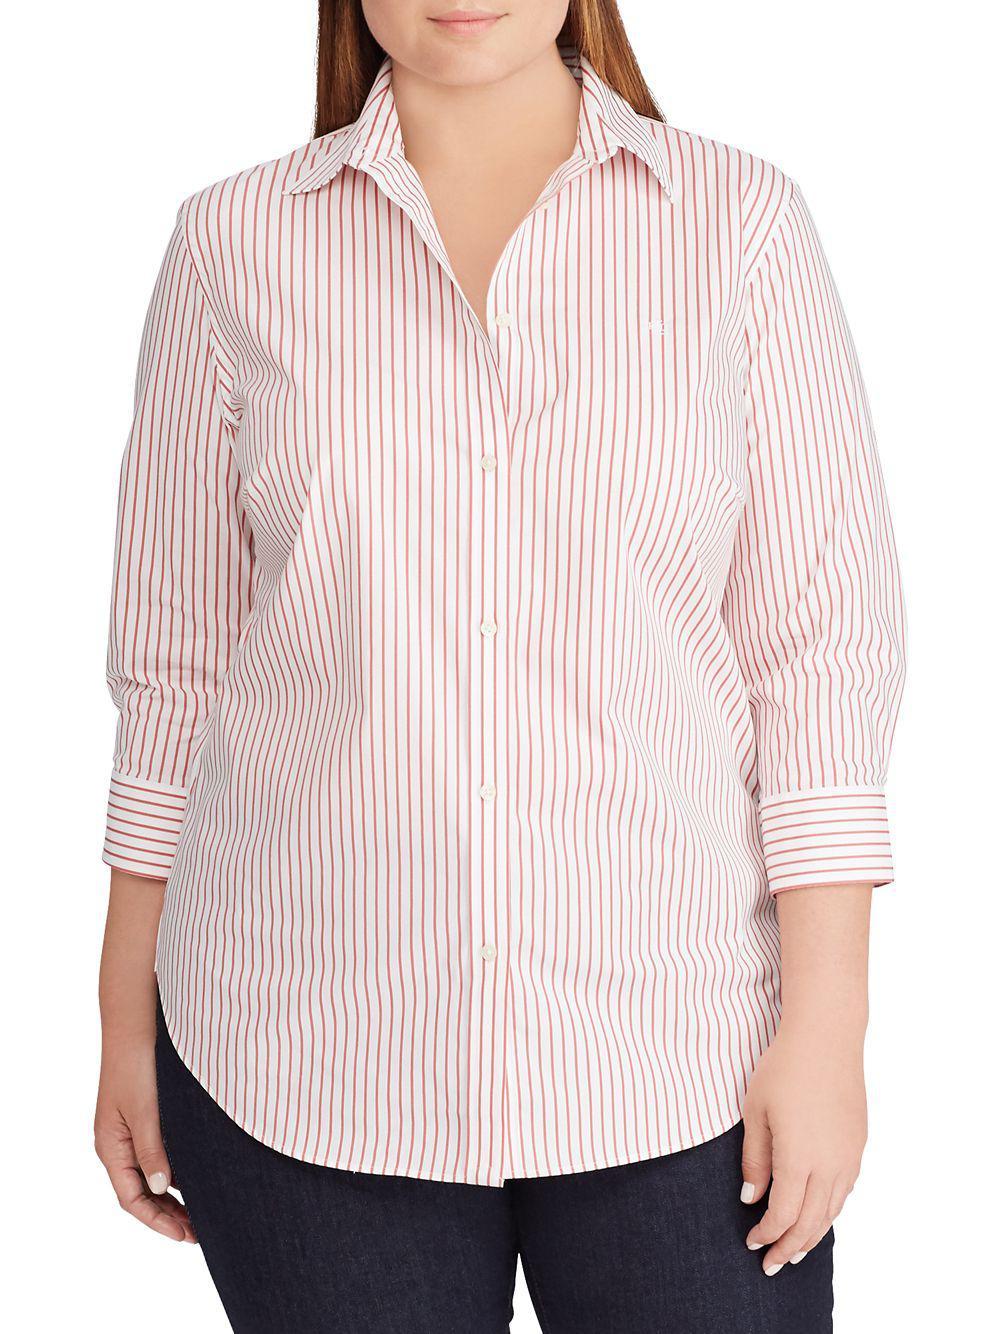 2caf83e04c1fc Lauren By Ralph Lauren Plus No-iron Pinstripe Shirt in Pink - Lyst